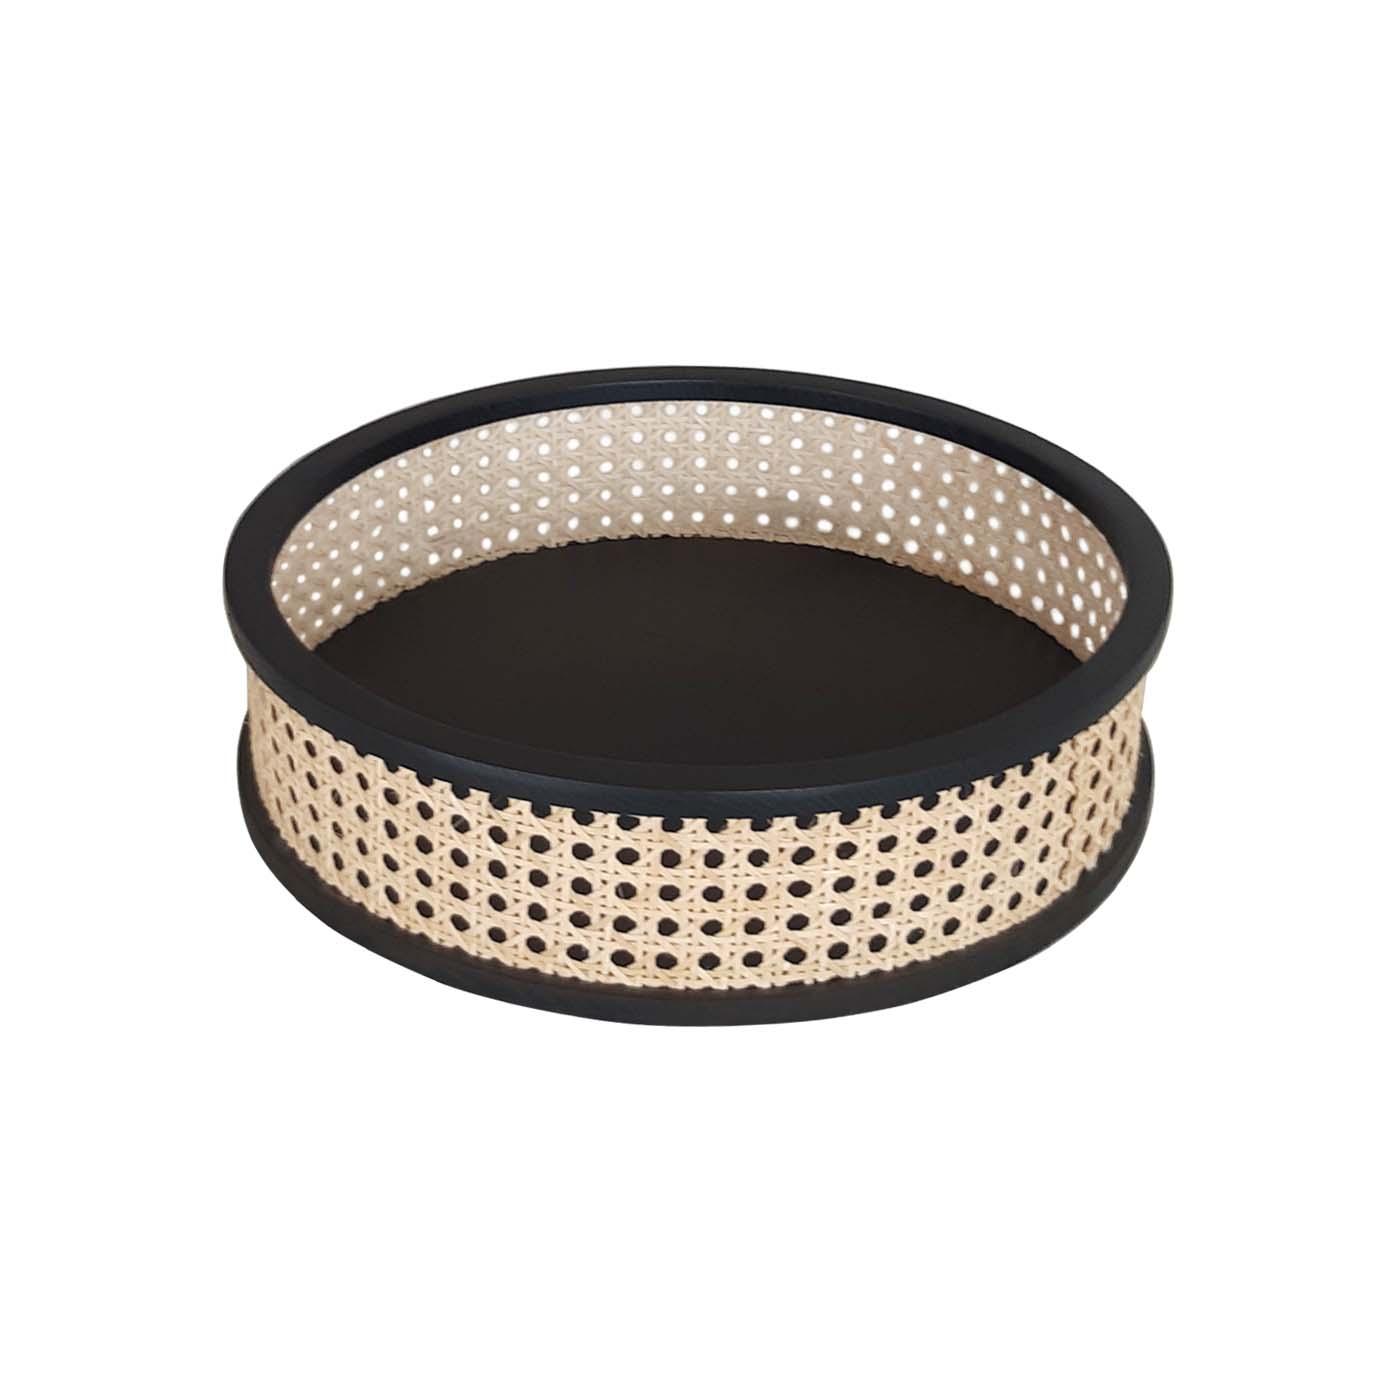 Ratargul Black Round Tray